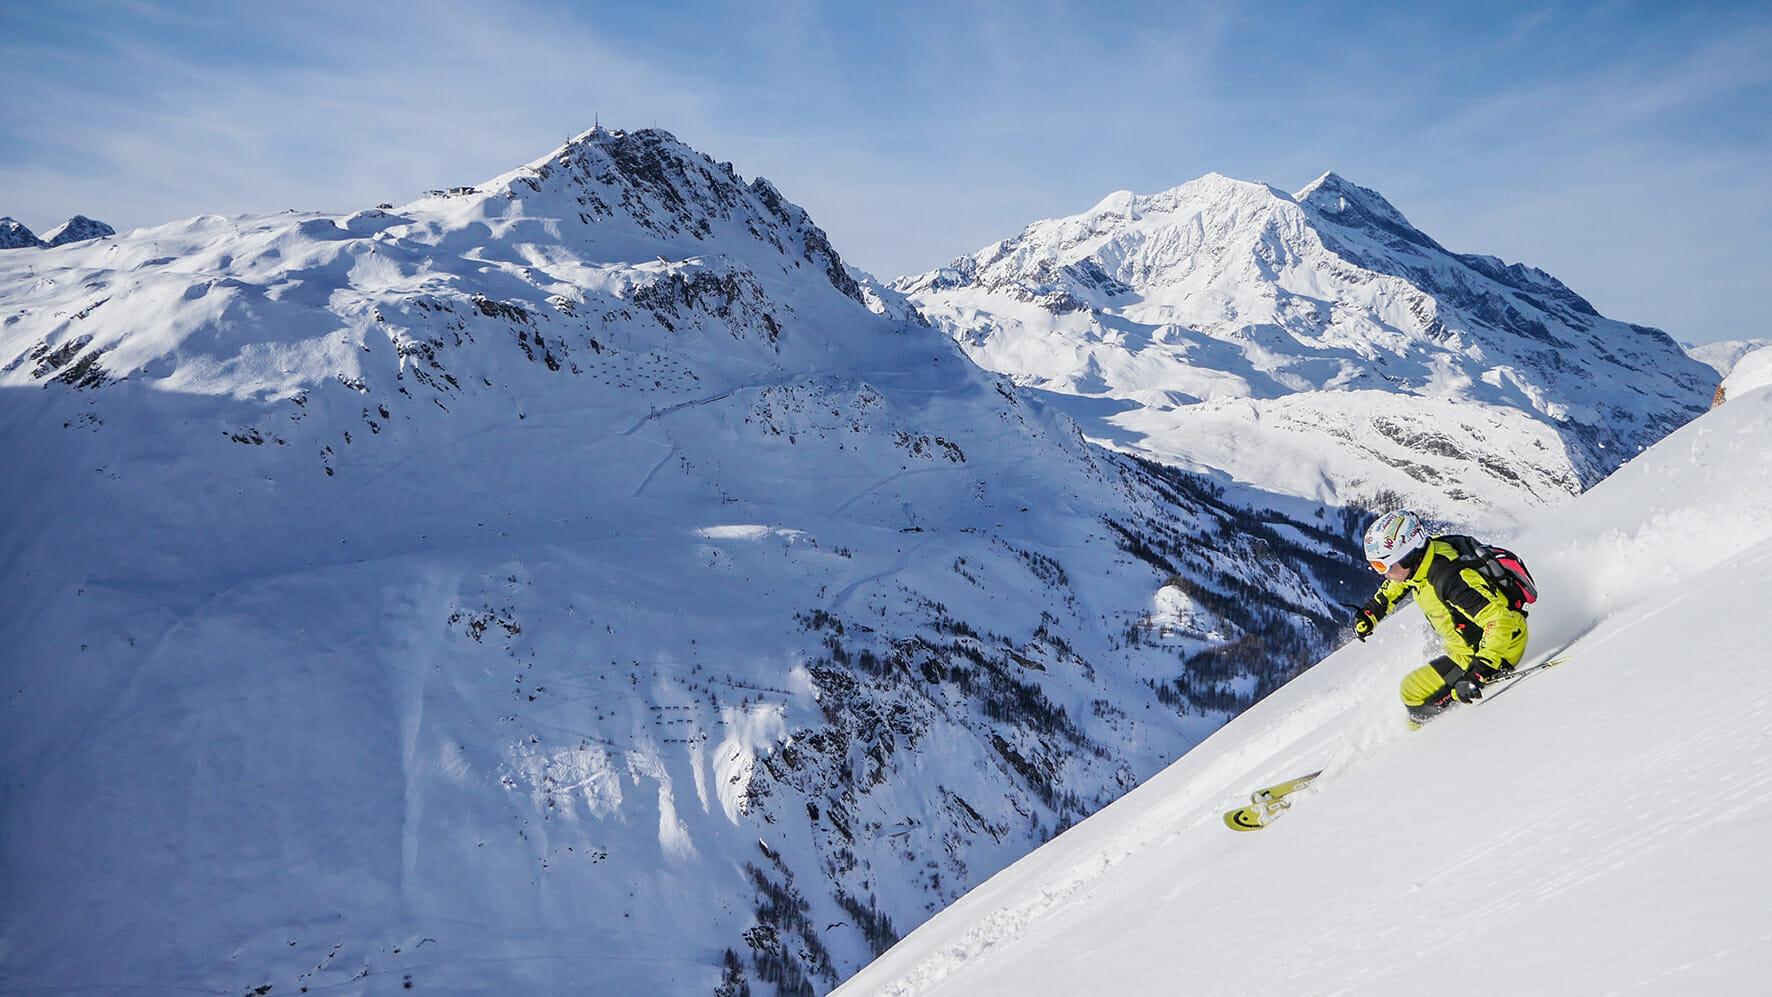 Exosquelette dans la pratique du ski